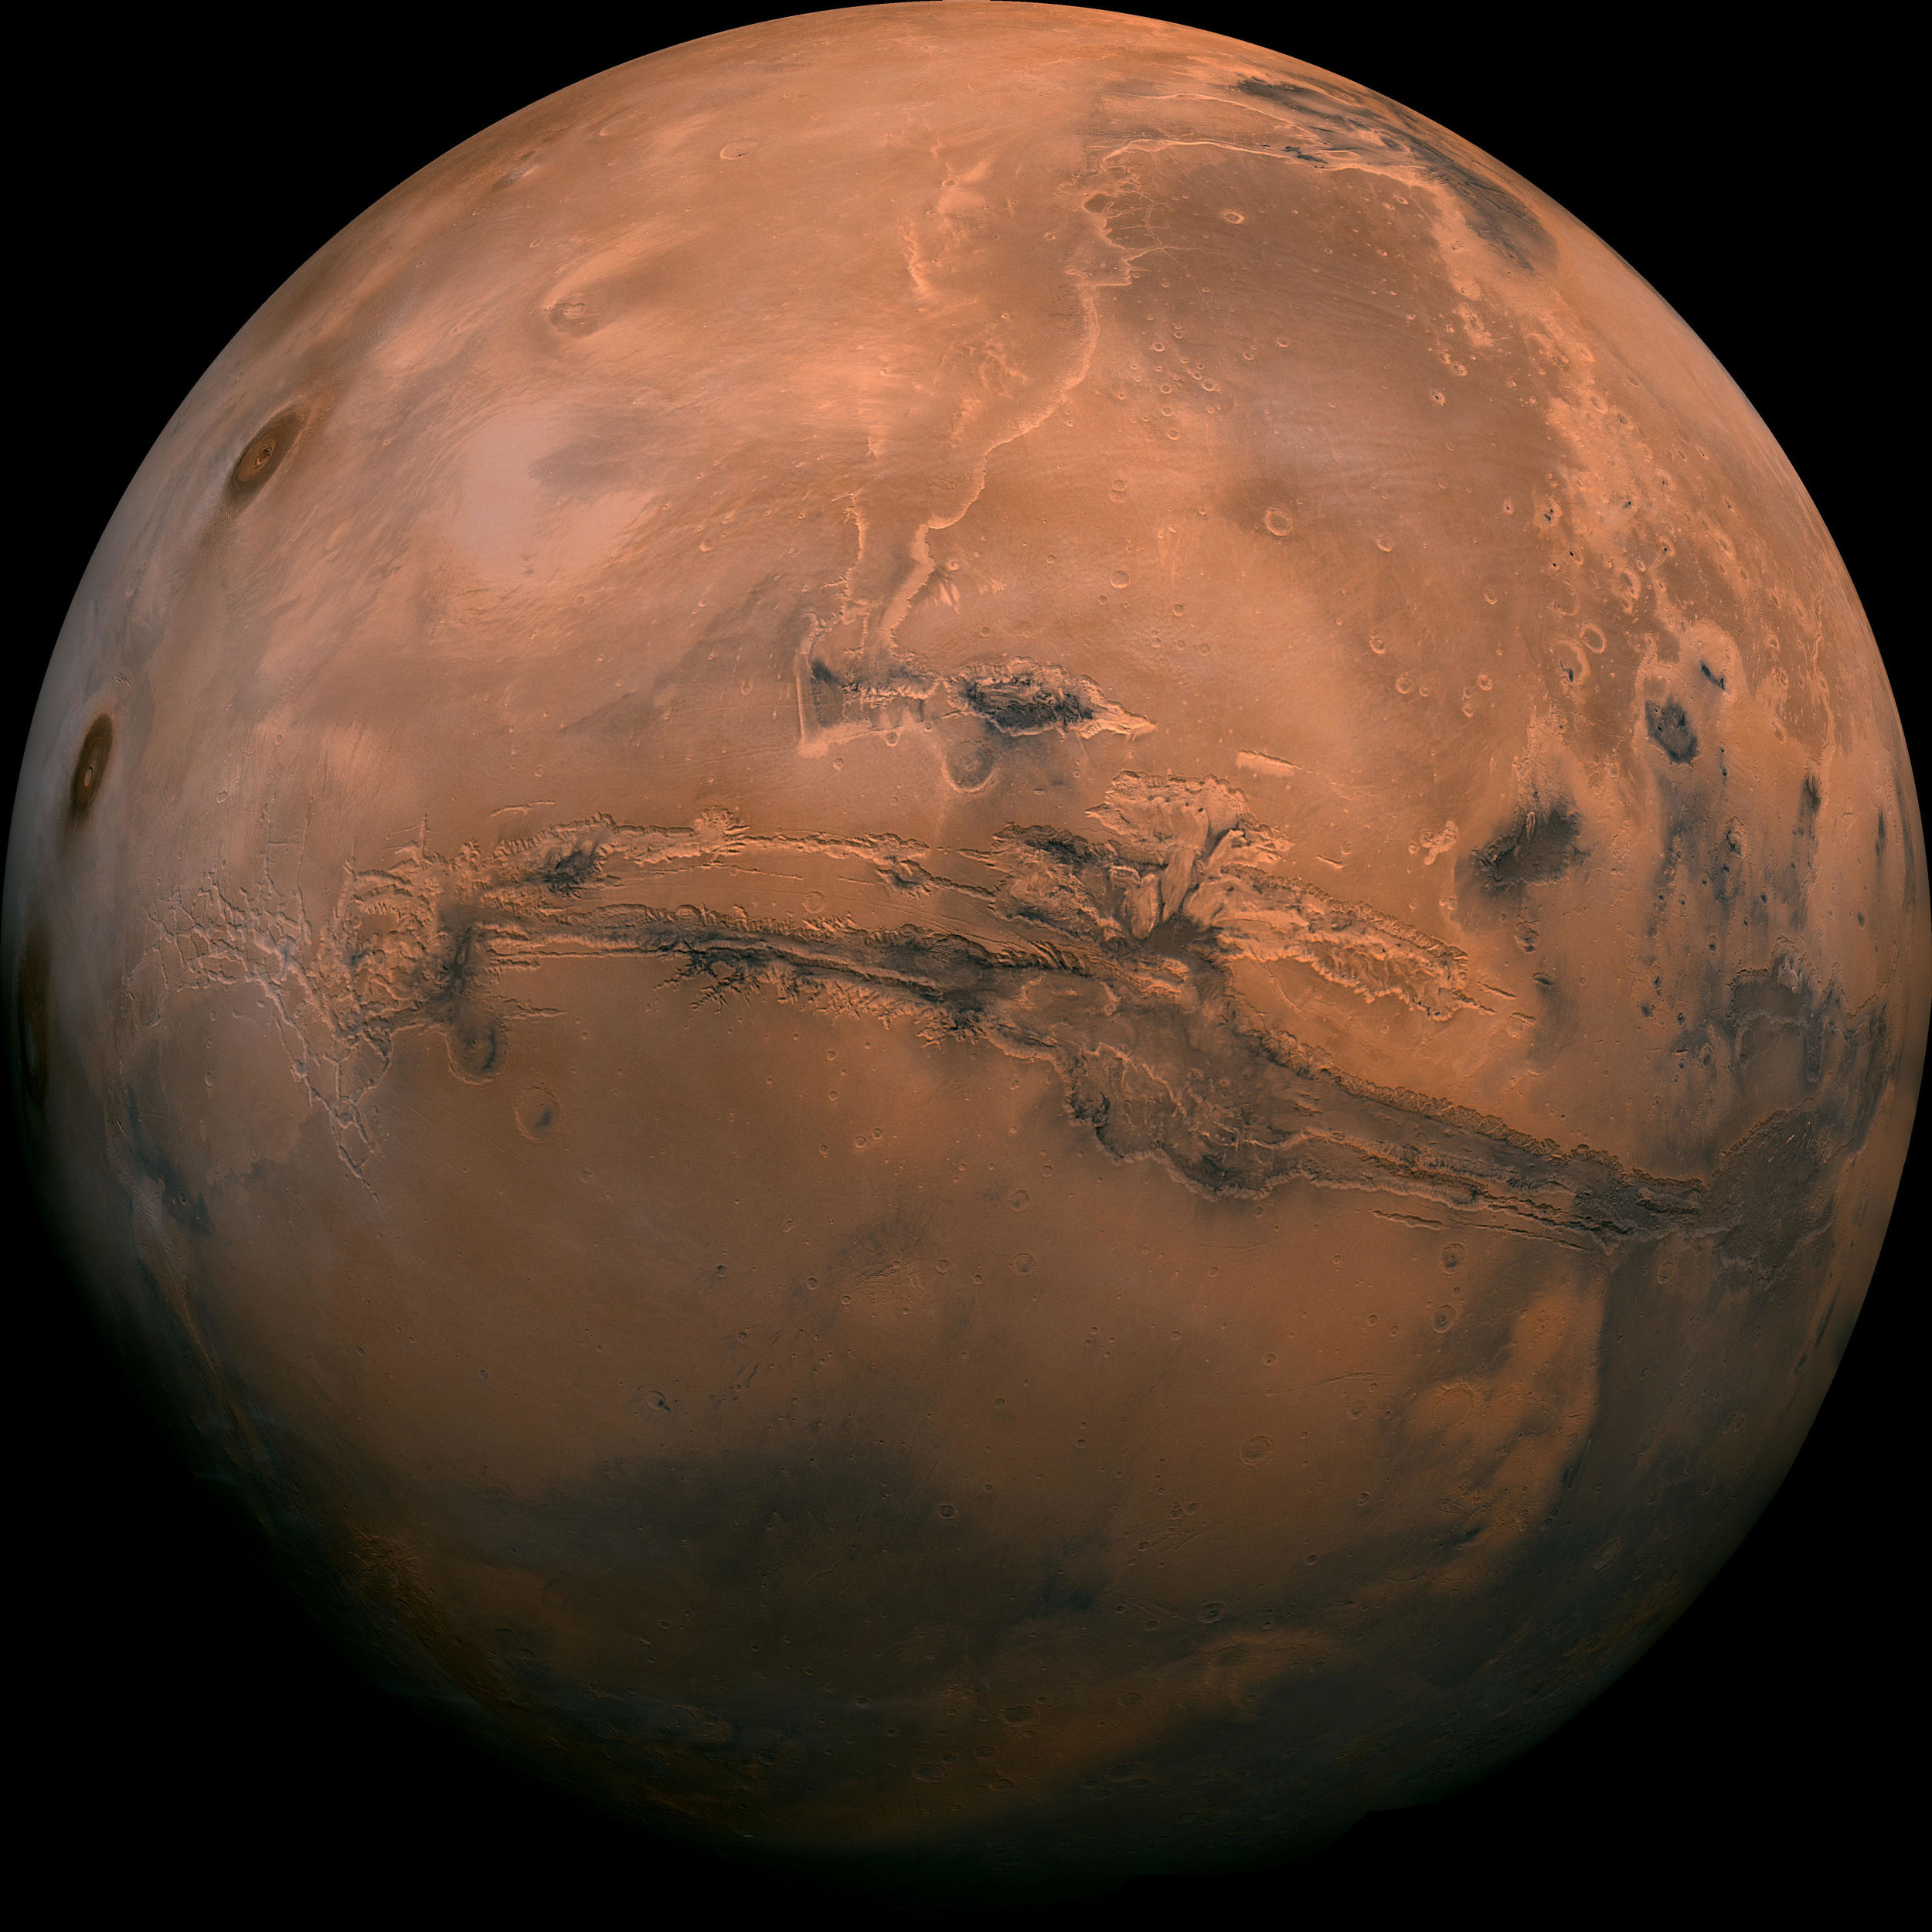 Mosaic of Mars composed of 102 Viking Orbiter images. Credit: NASA/JPL-Caltech